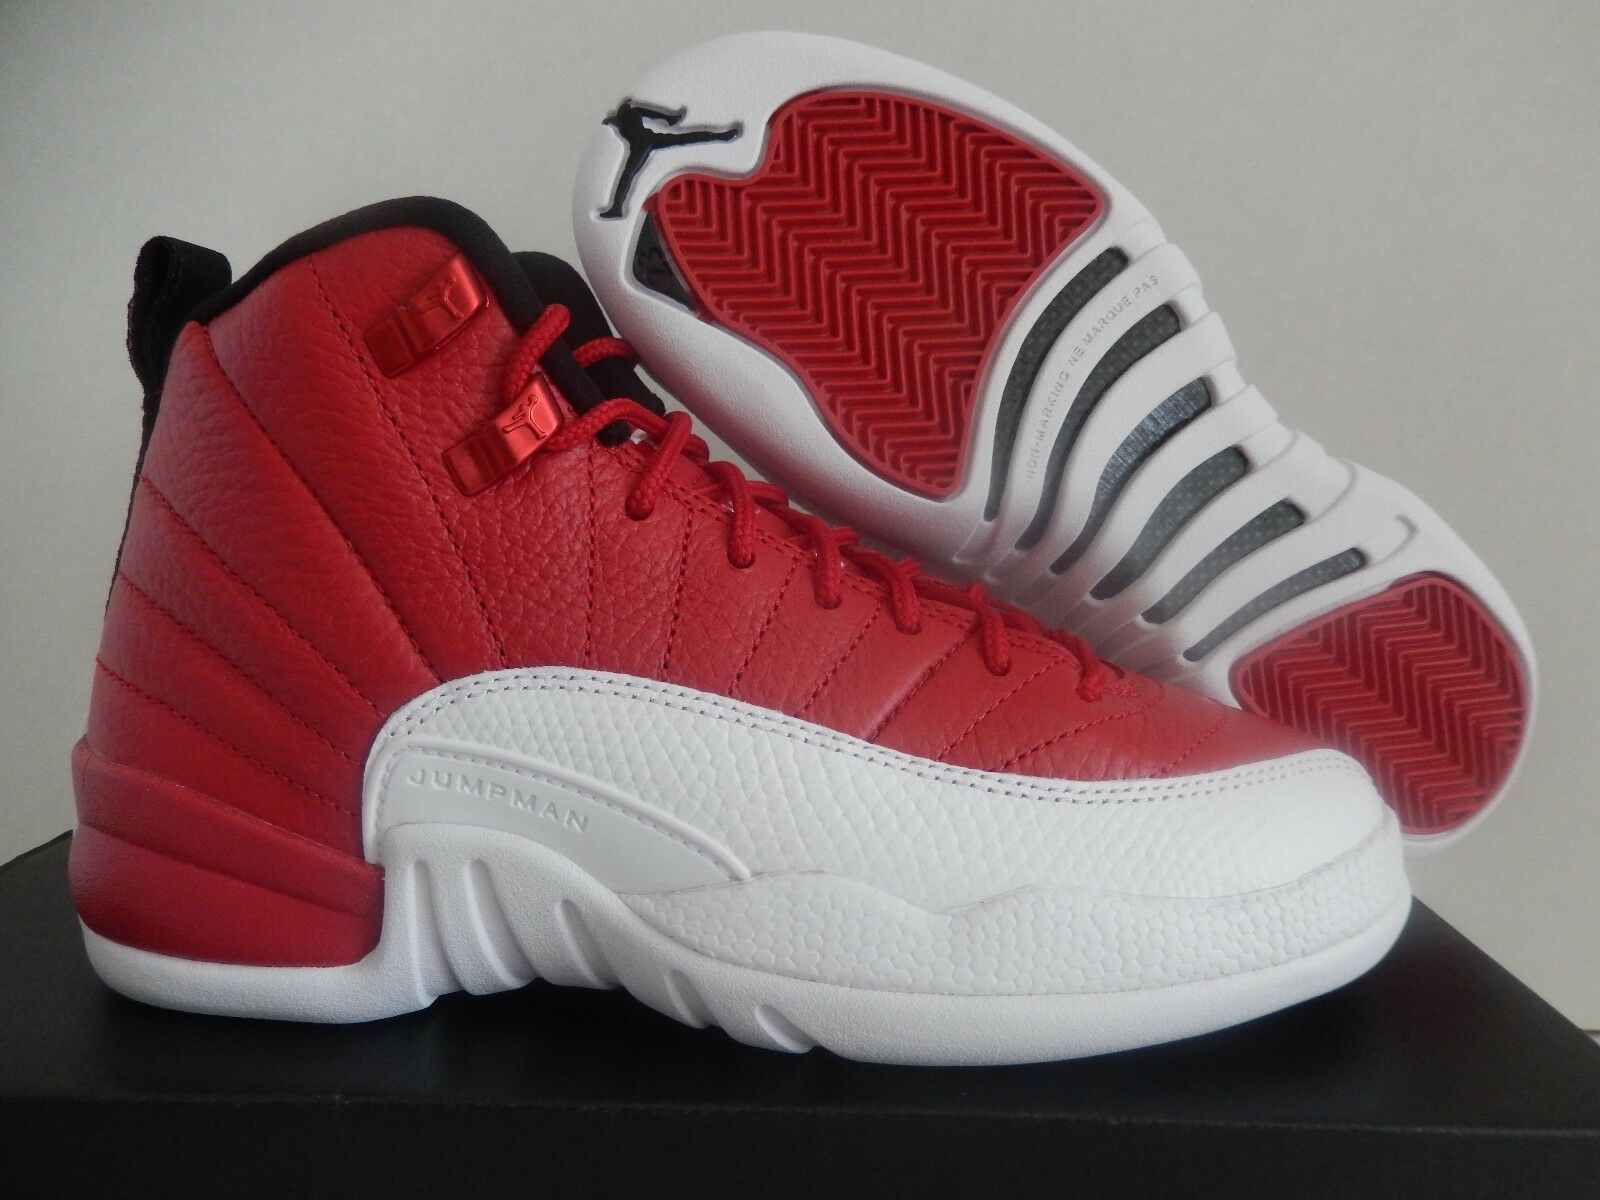 Nike Air Jordan Jordan Jordan 12 Retro (Bg) Rojo  alternativo  tamaño 4Y-Para Mujer Talla 5.5  40% de descuento